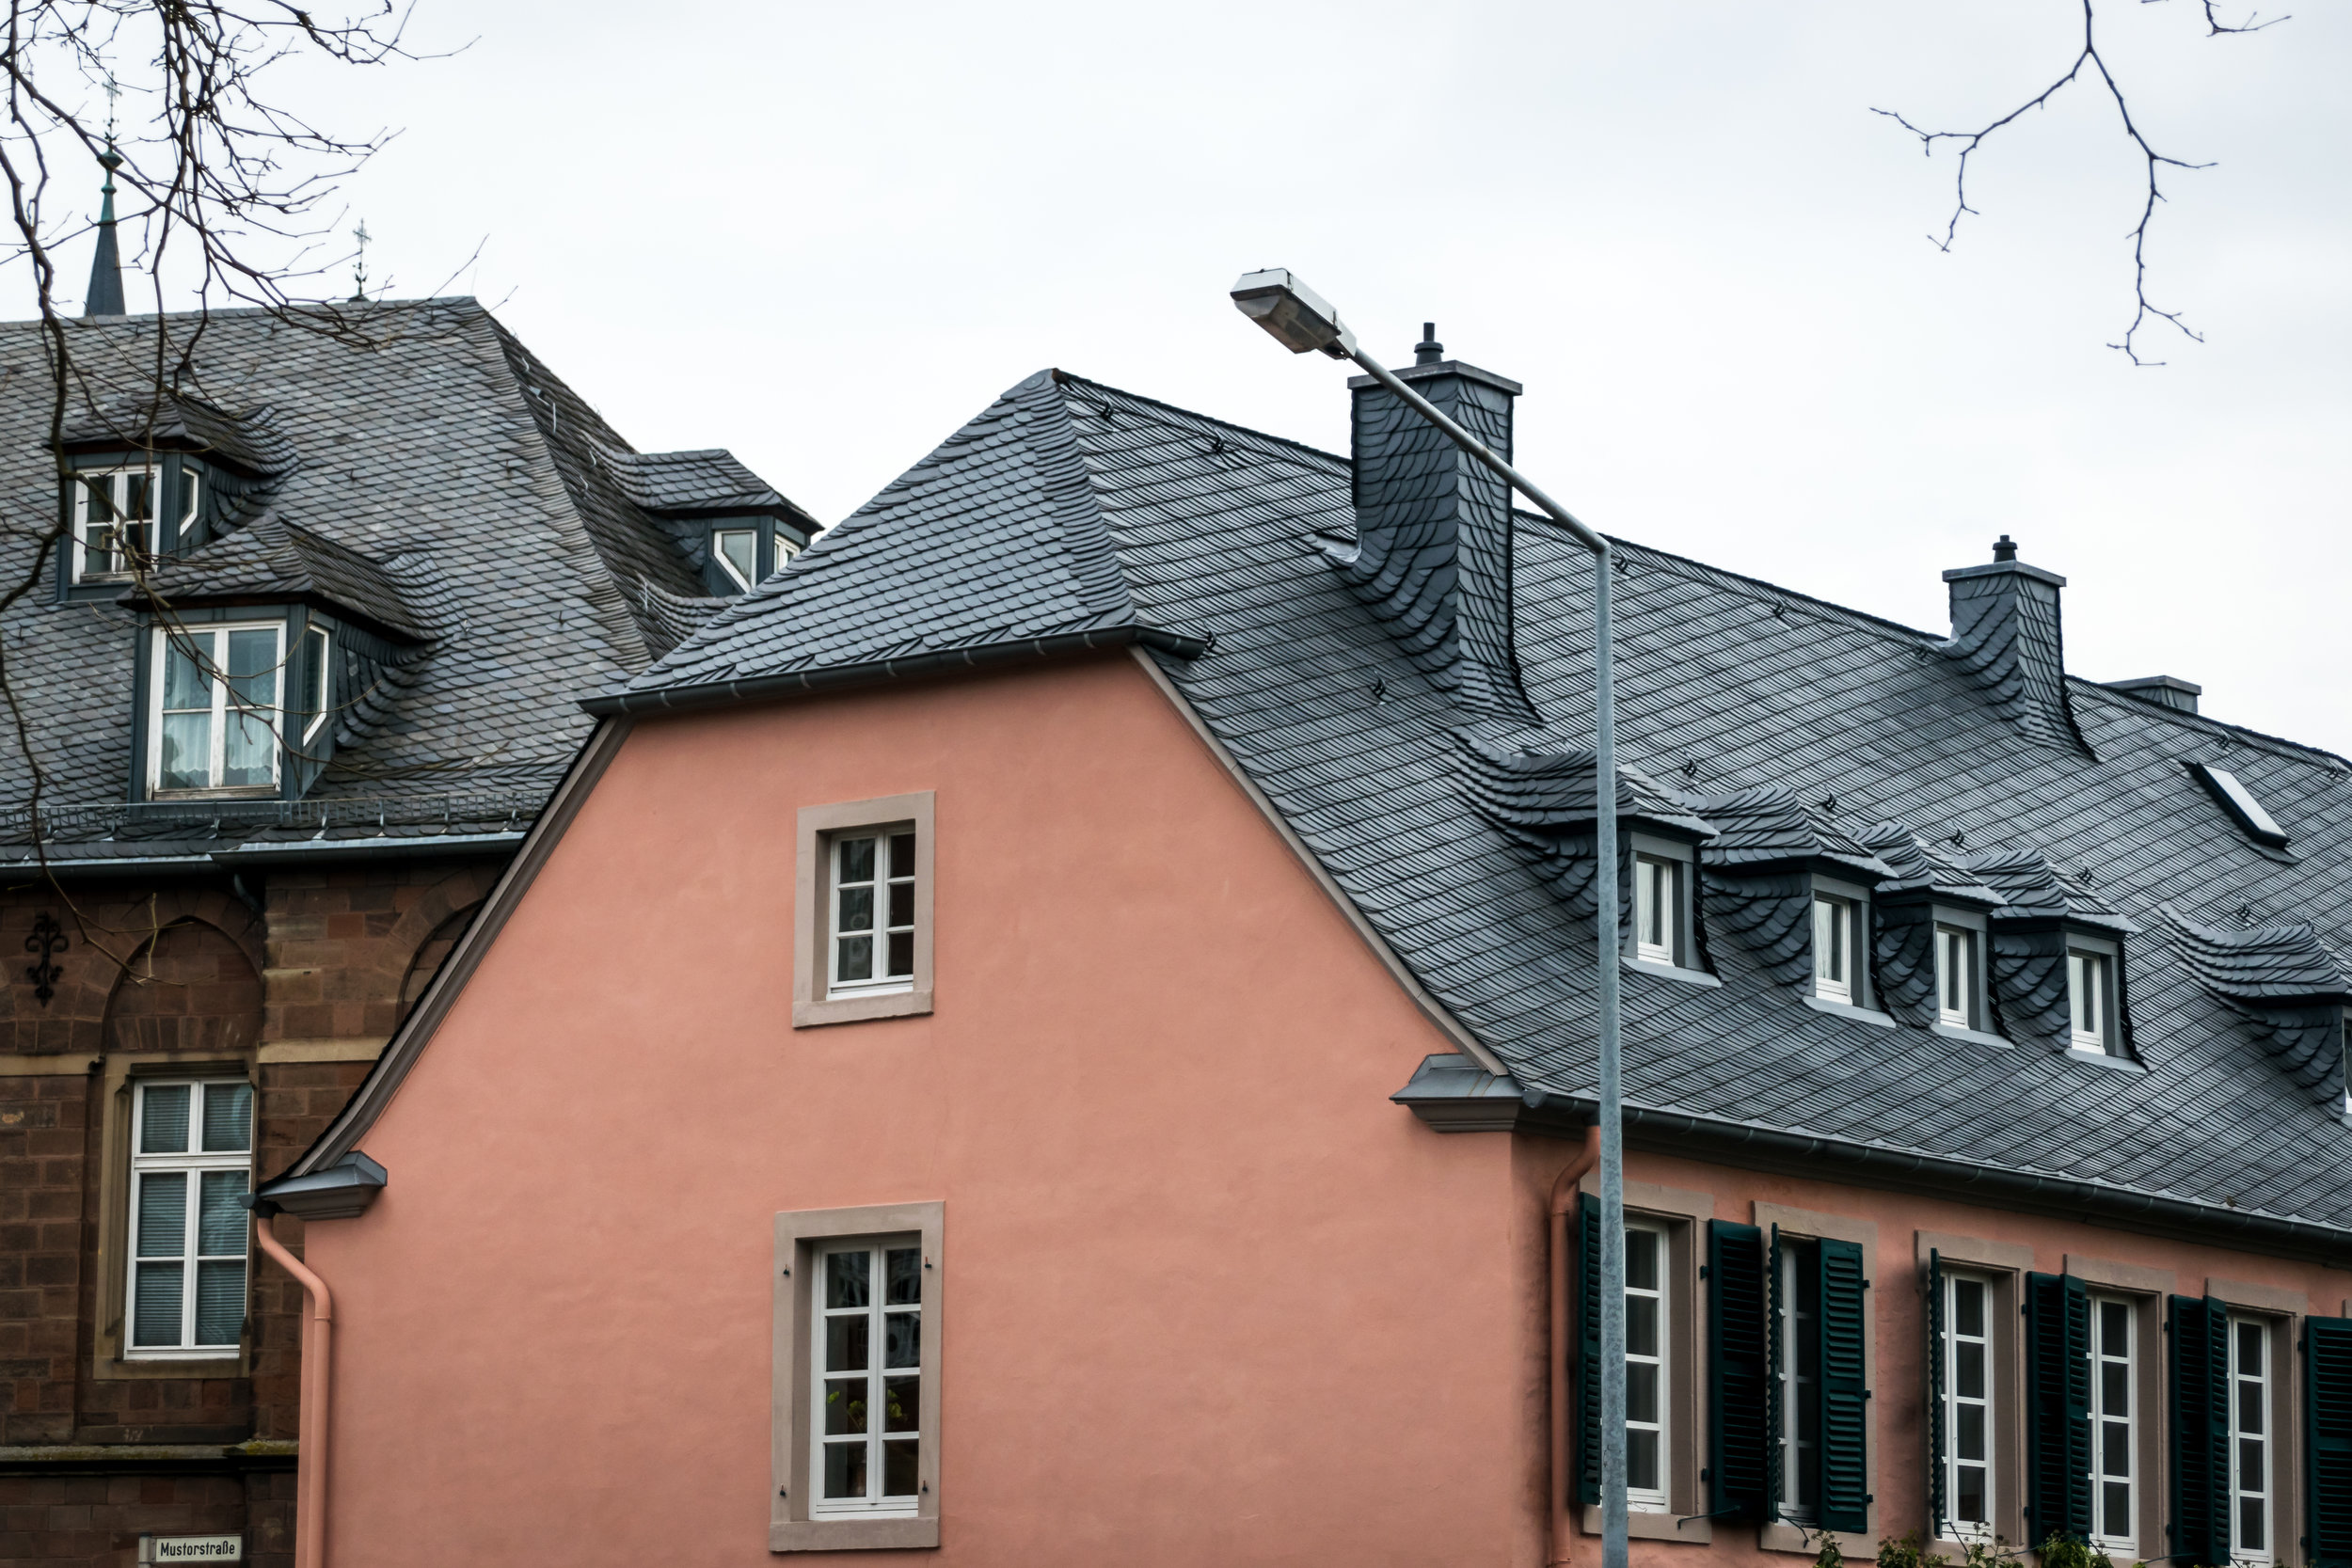 loving the slate tile roof details